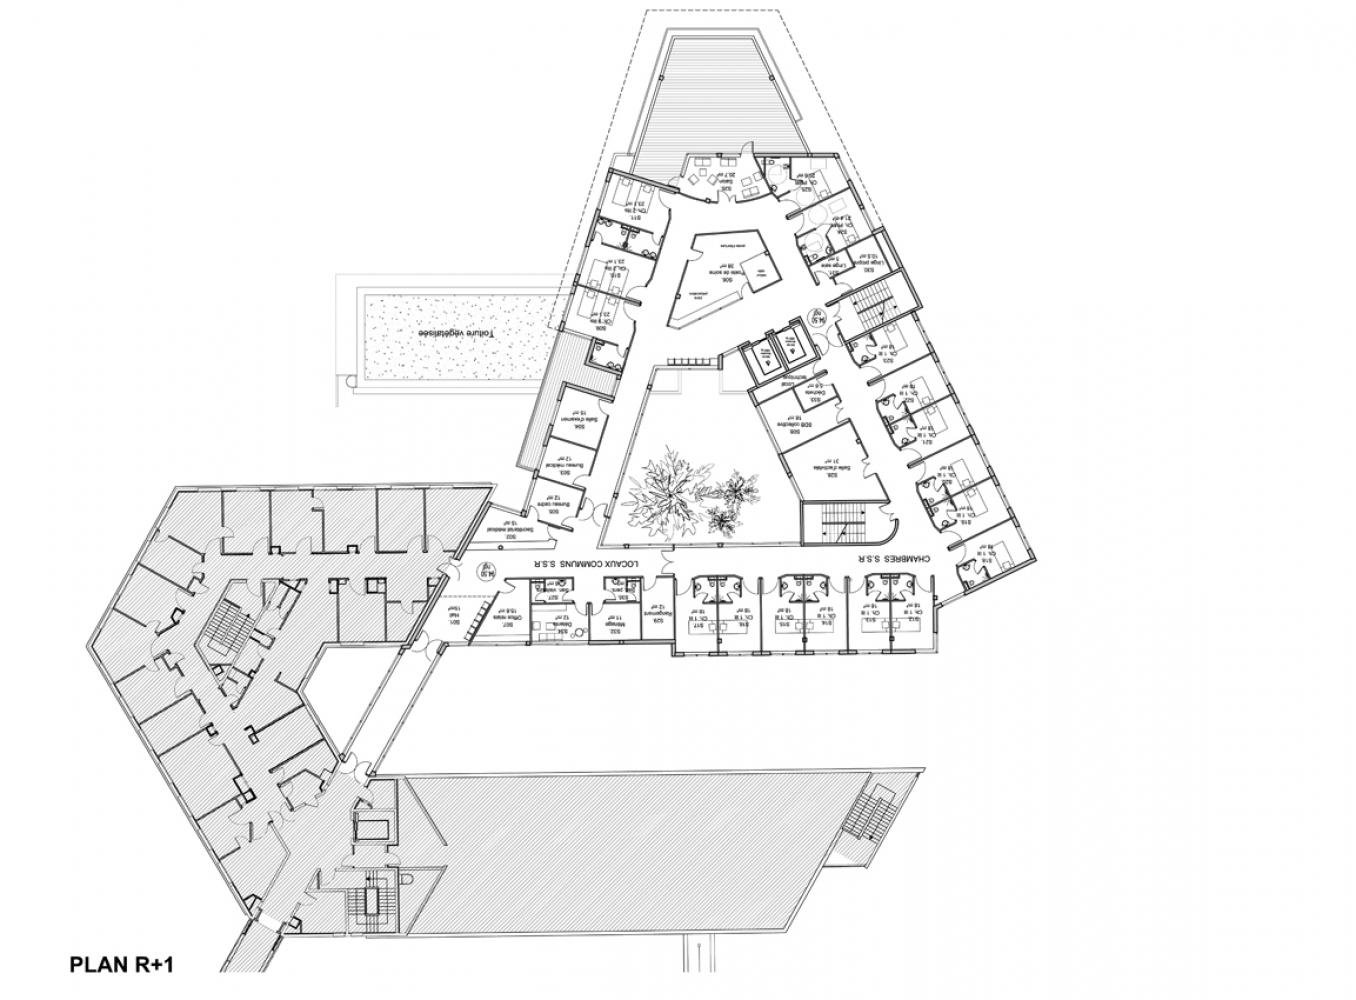 zbeau---04 Pascale SEURIN Architecte - Pascale SEURIN Architecte